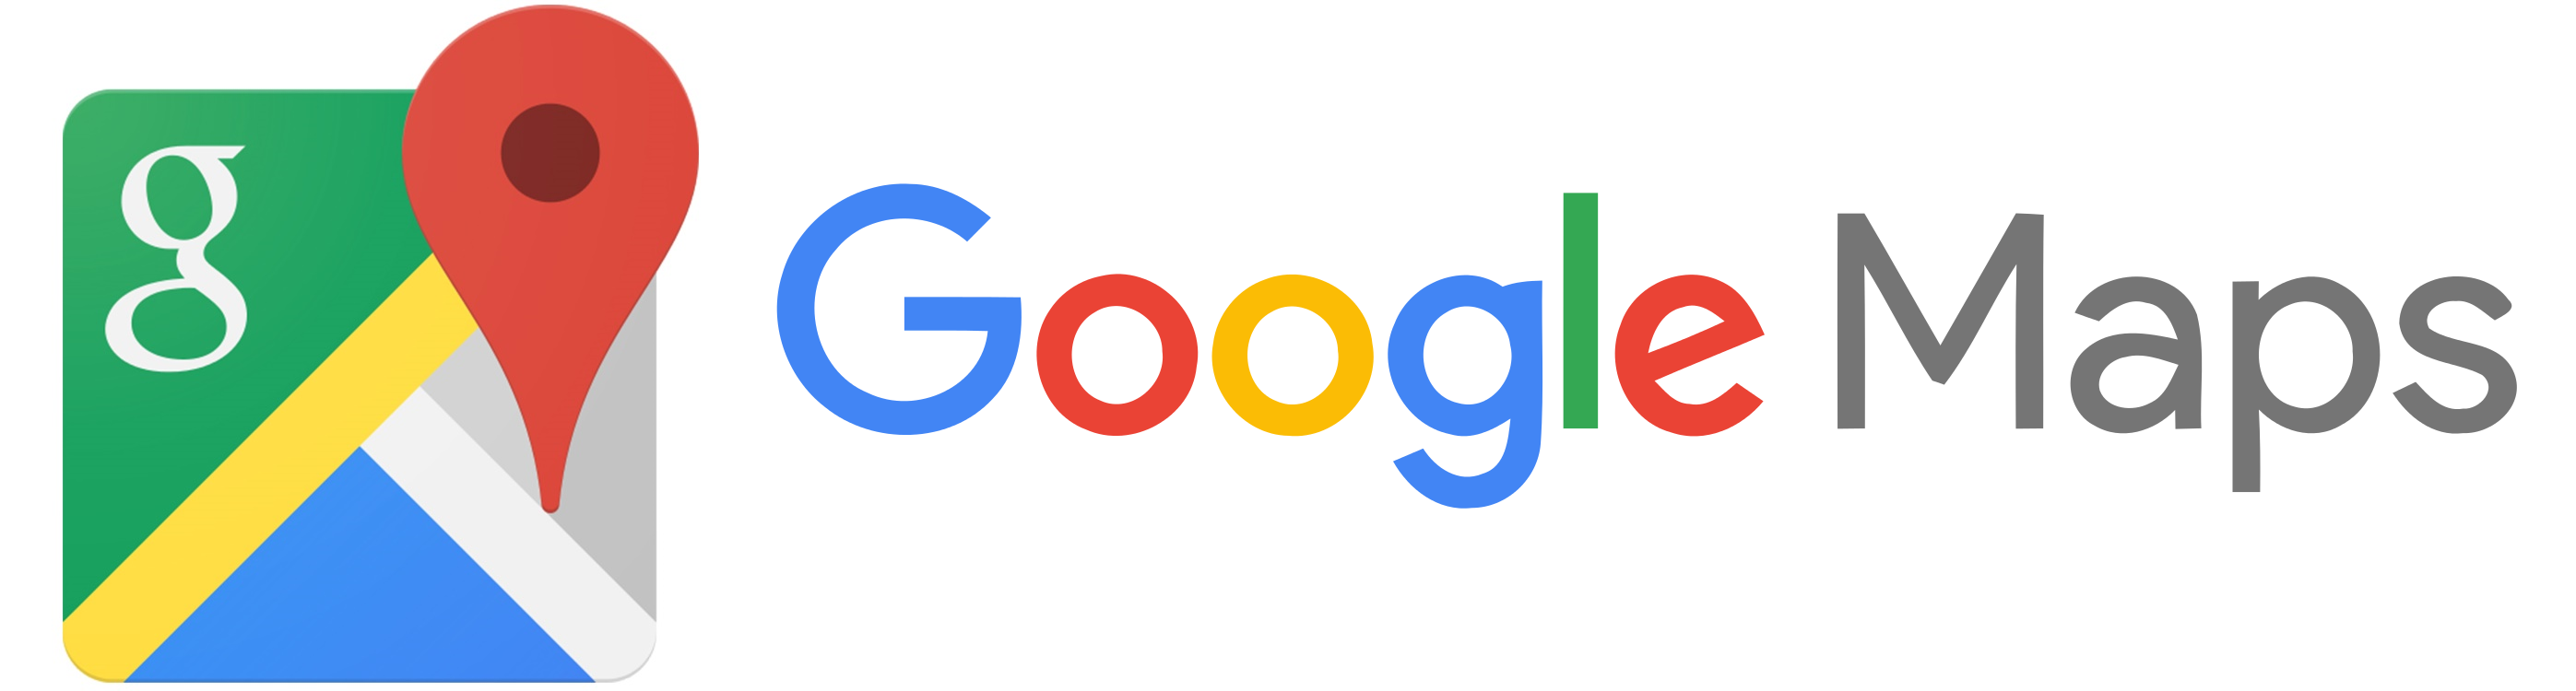 Navegar INMOXARA con google